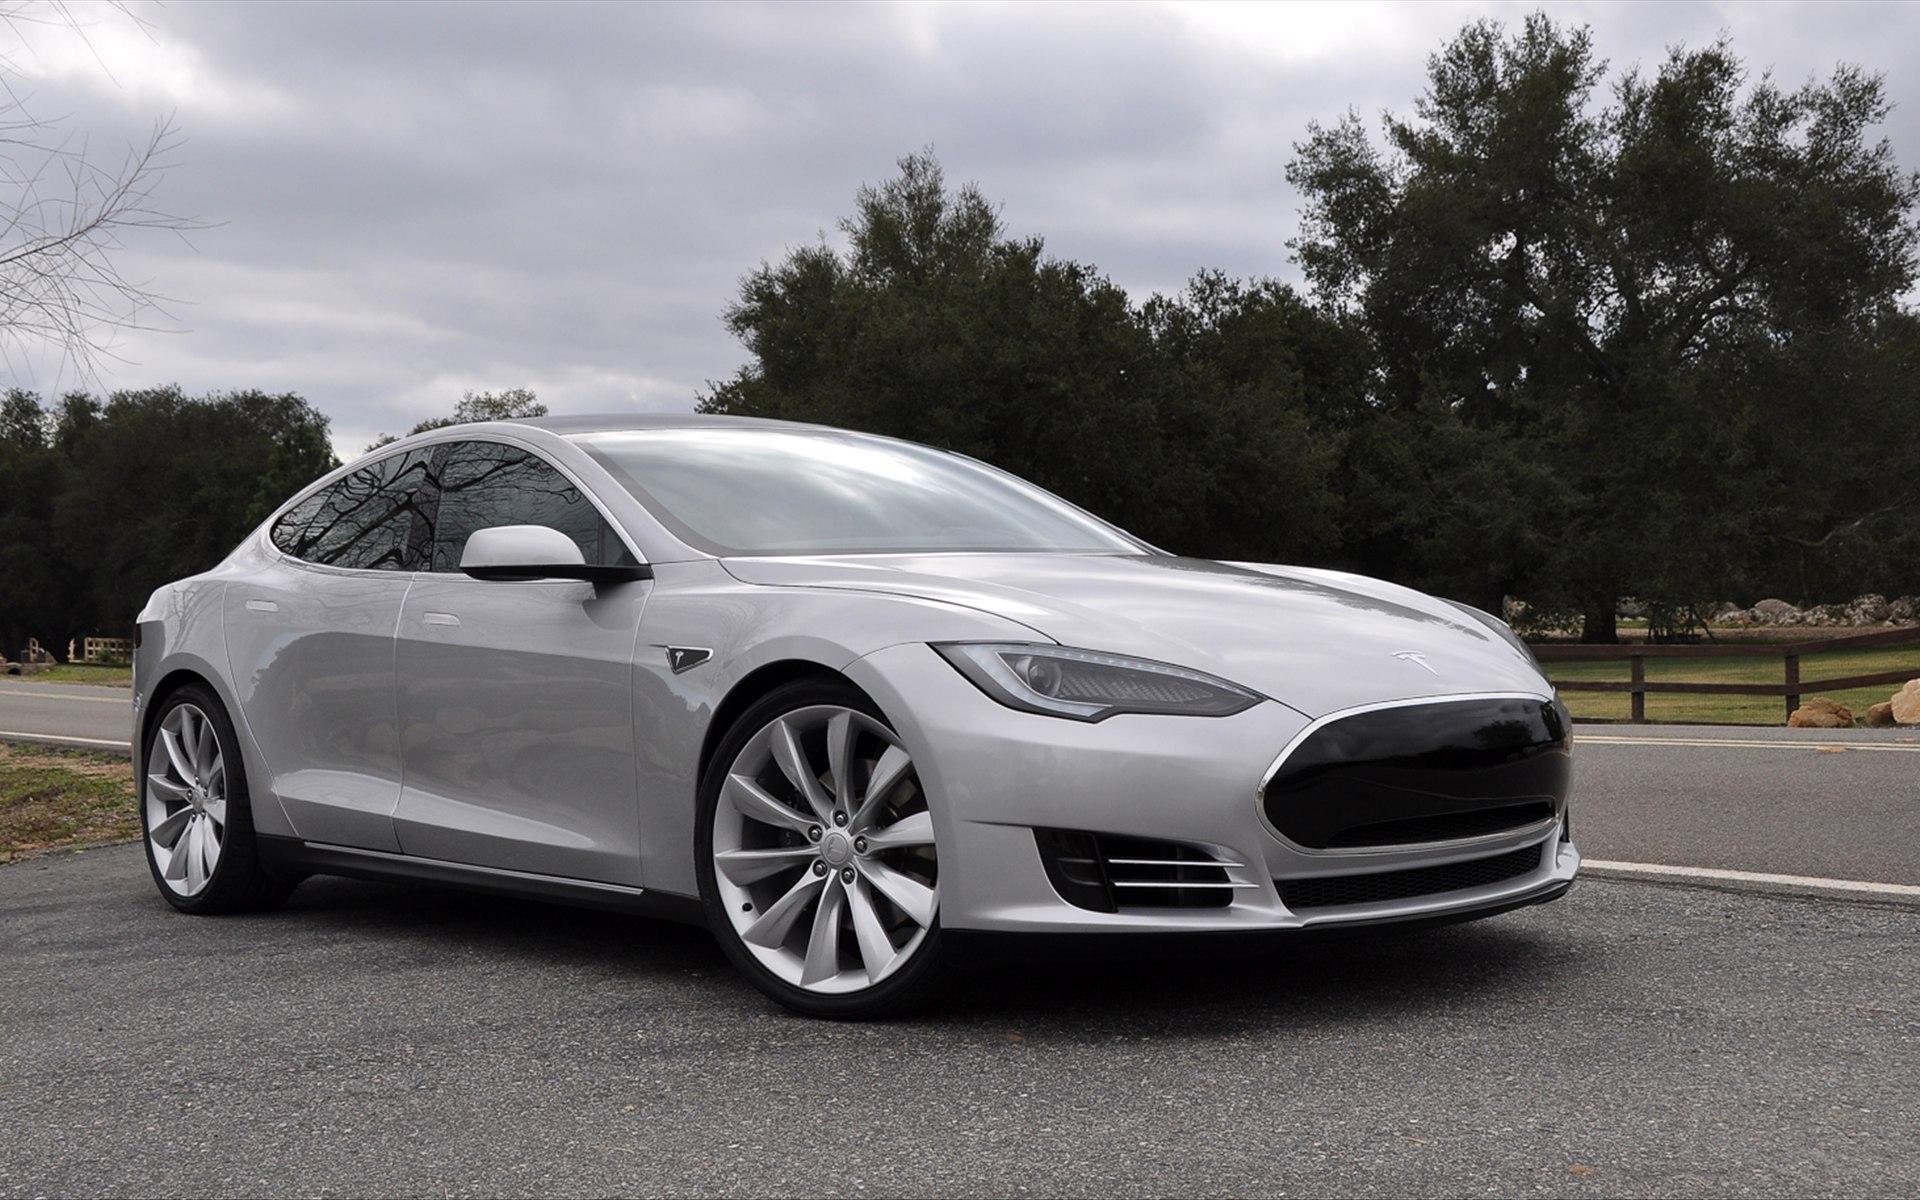 2014 Tesla wallpaper downloads High resolution images for 1920x1200